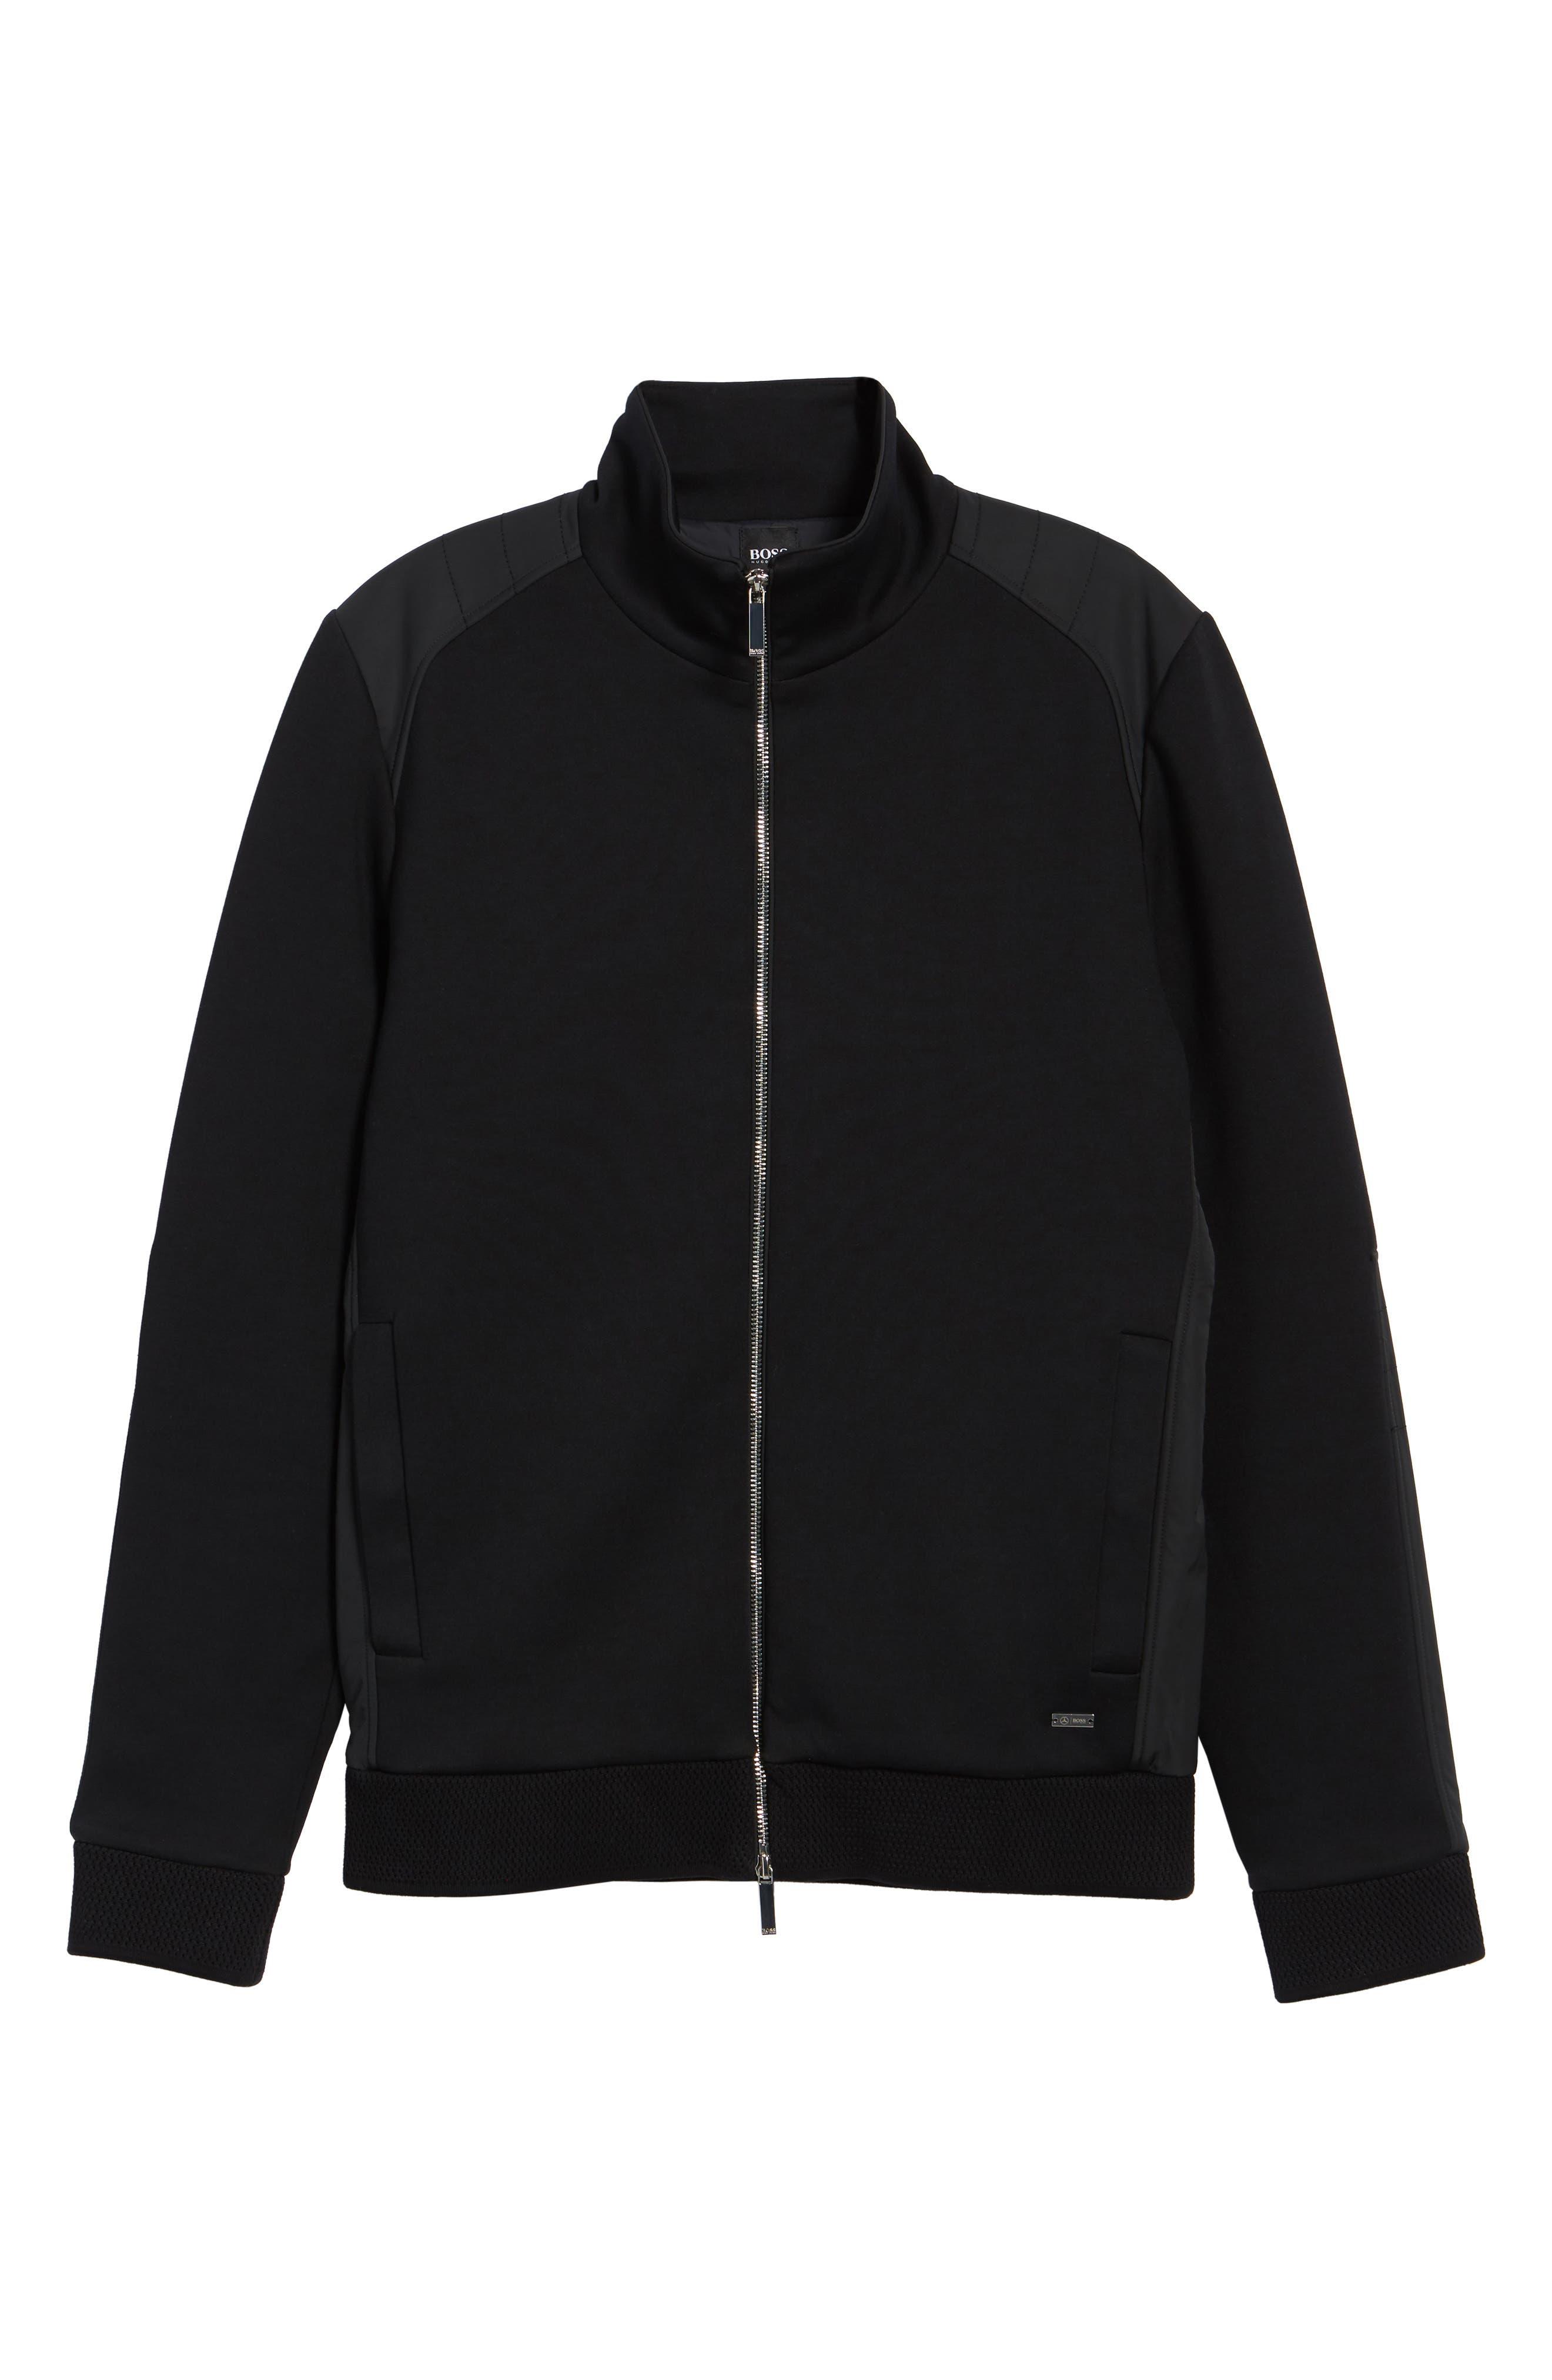 Soule Mercedes Slim Fit Zip Jacket,                             Alternate thumbnail 6, color,                             Black